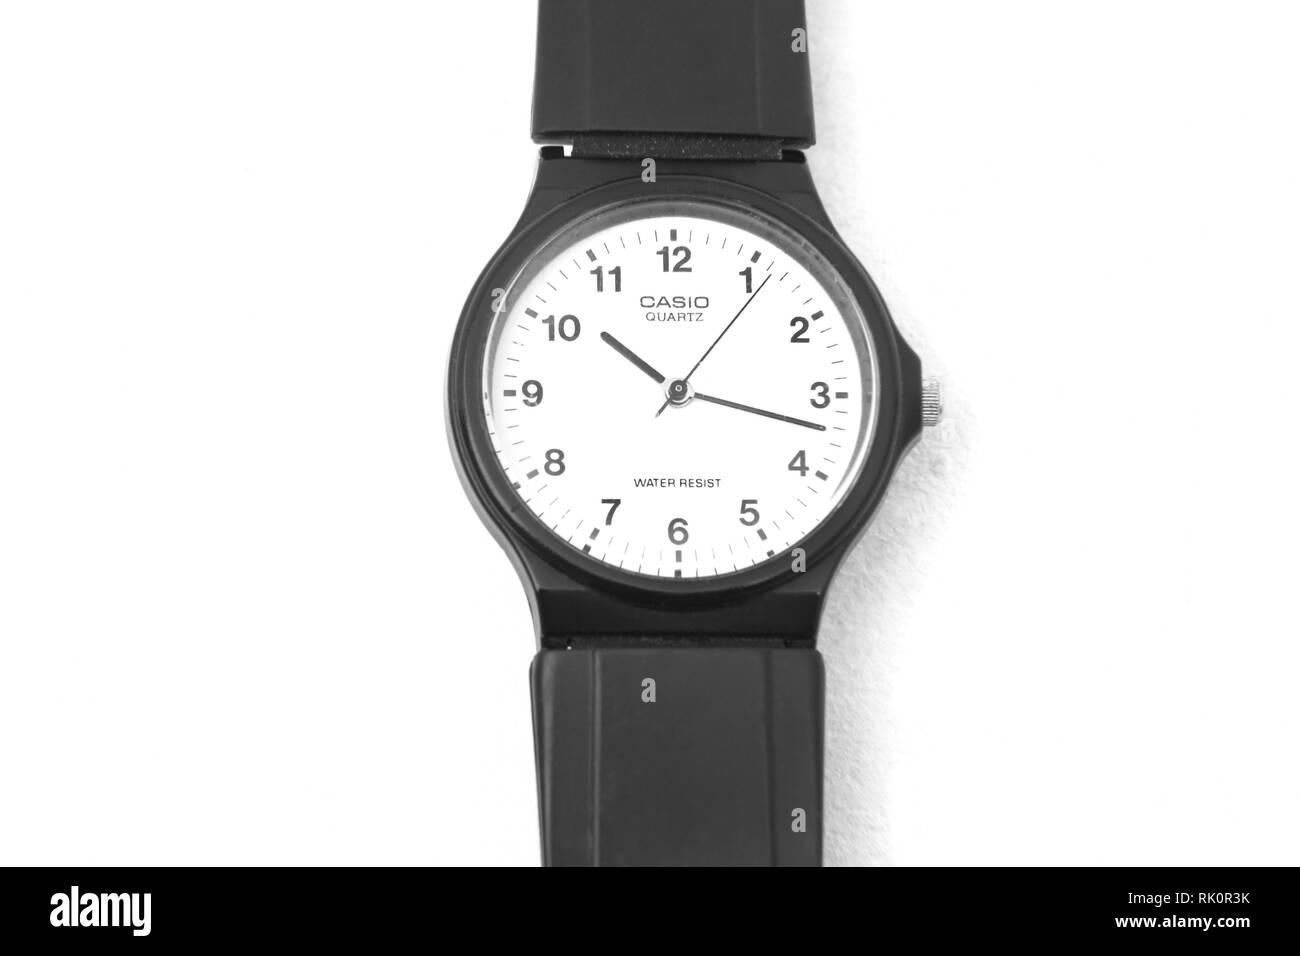 Casio Quartz Water Resistant Watch with Black Strap - Stock Image